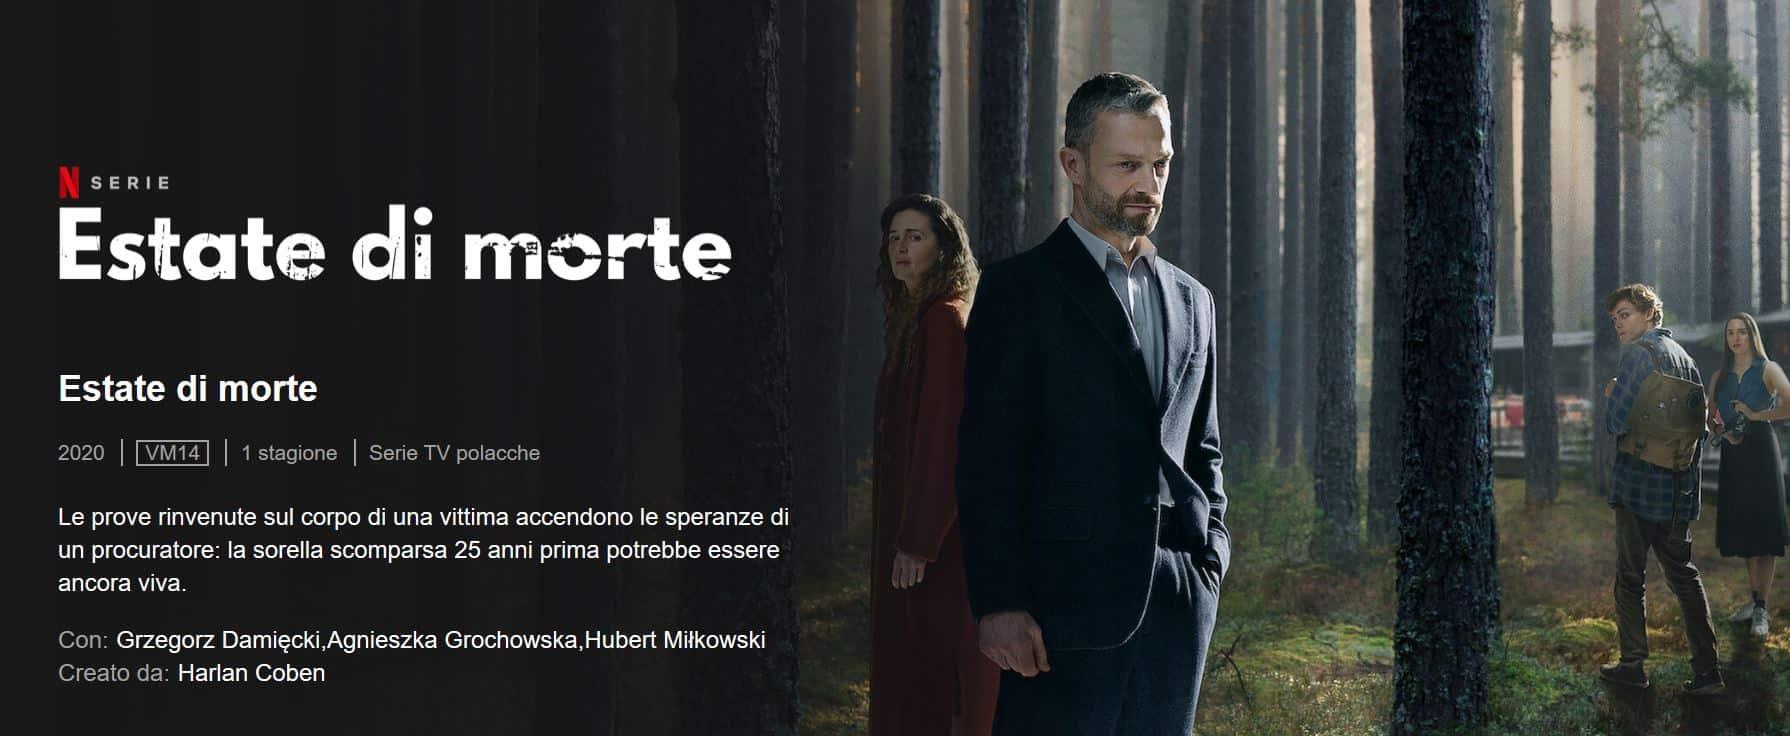 Serie da vedere su Netflix in estate: The Woods-Estate di morte consigliatissima